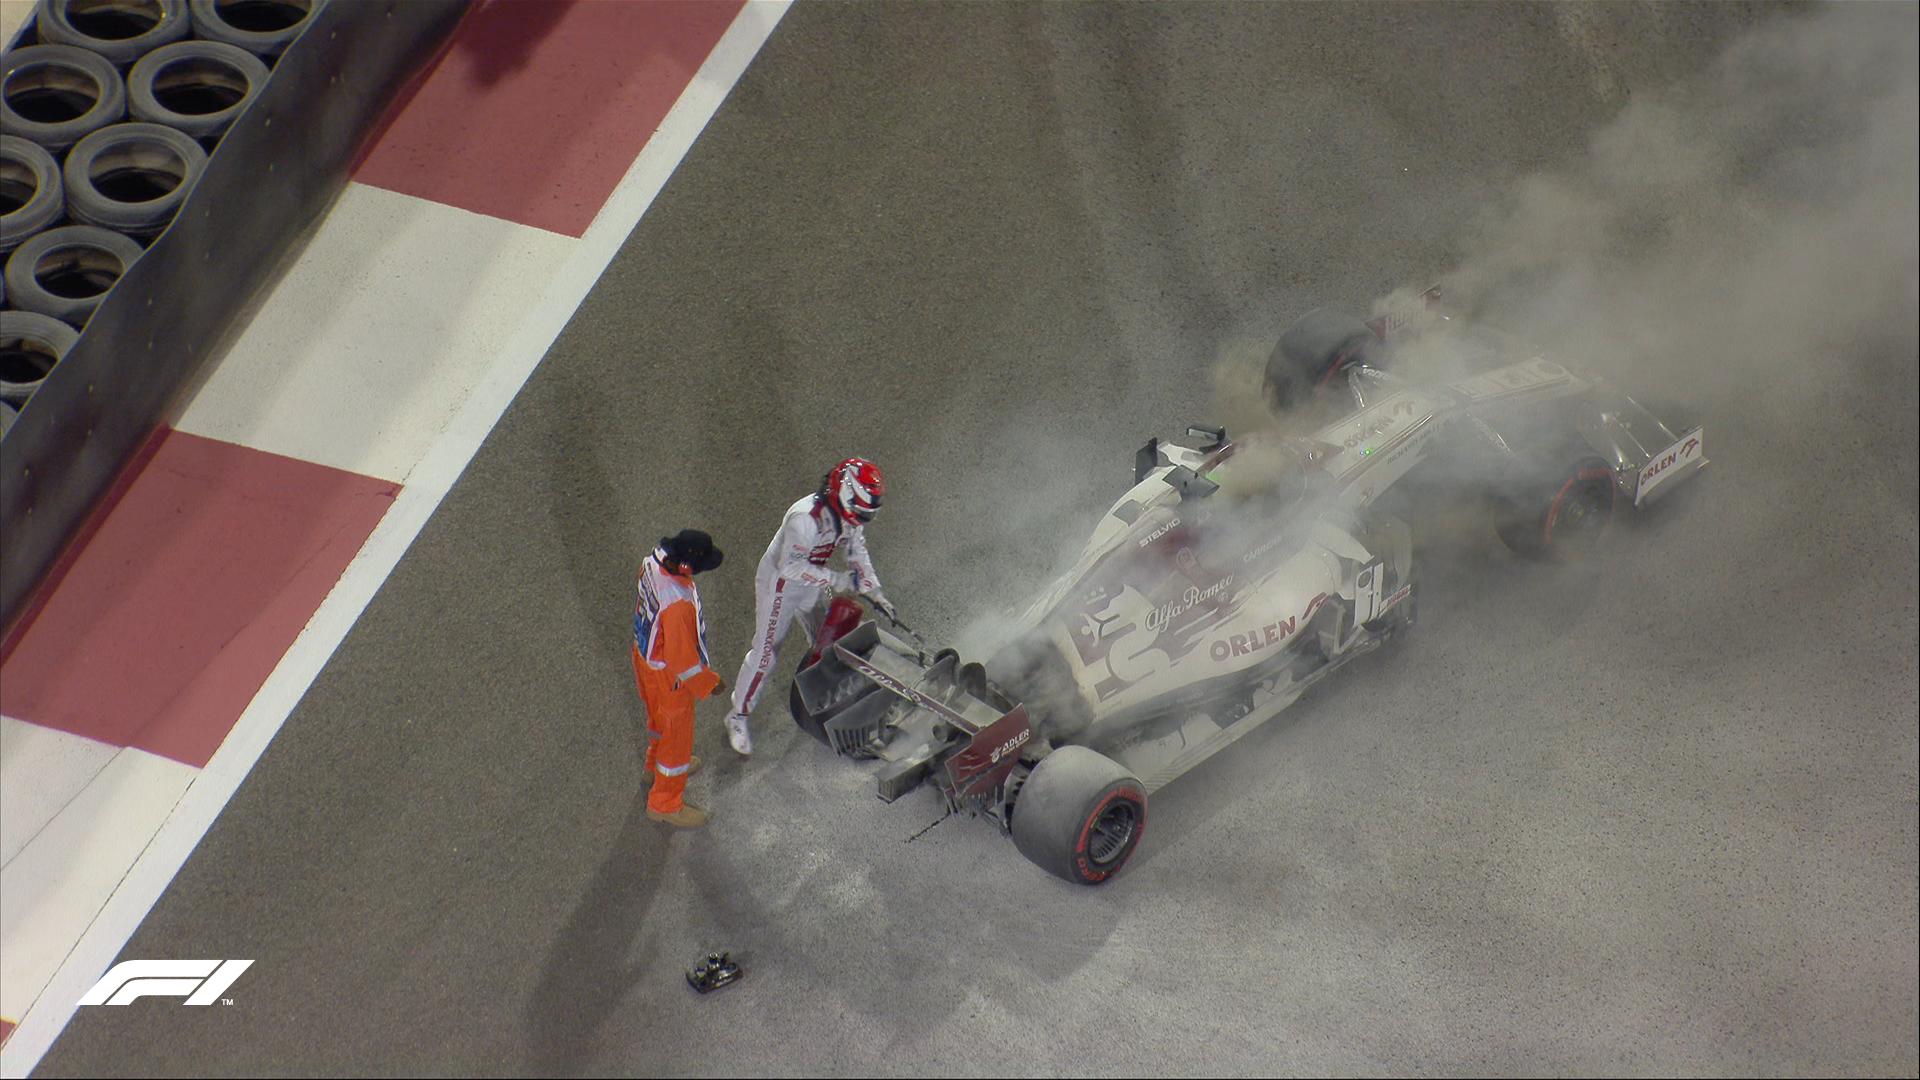 Gp Abu Dhabi 2020-FP2: Test Pirelli e bandiera rossa, pochi dati sul passo gara, Ferrari fatica...